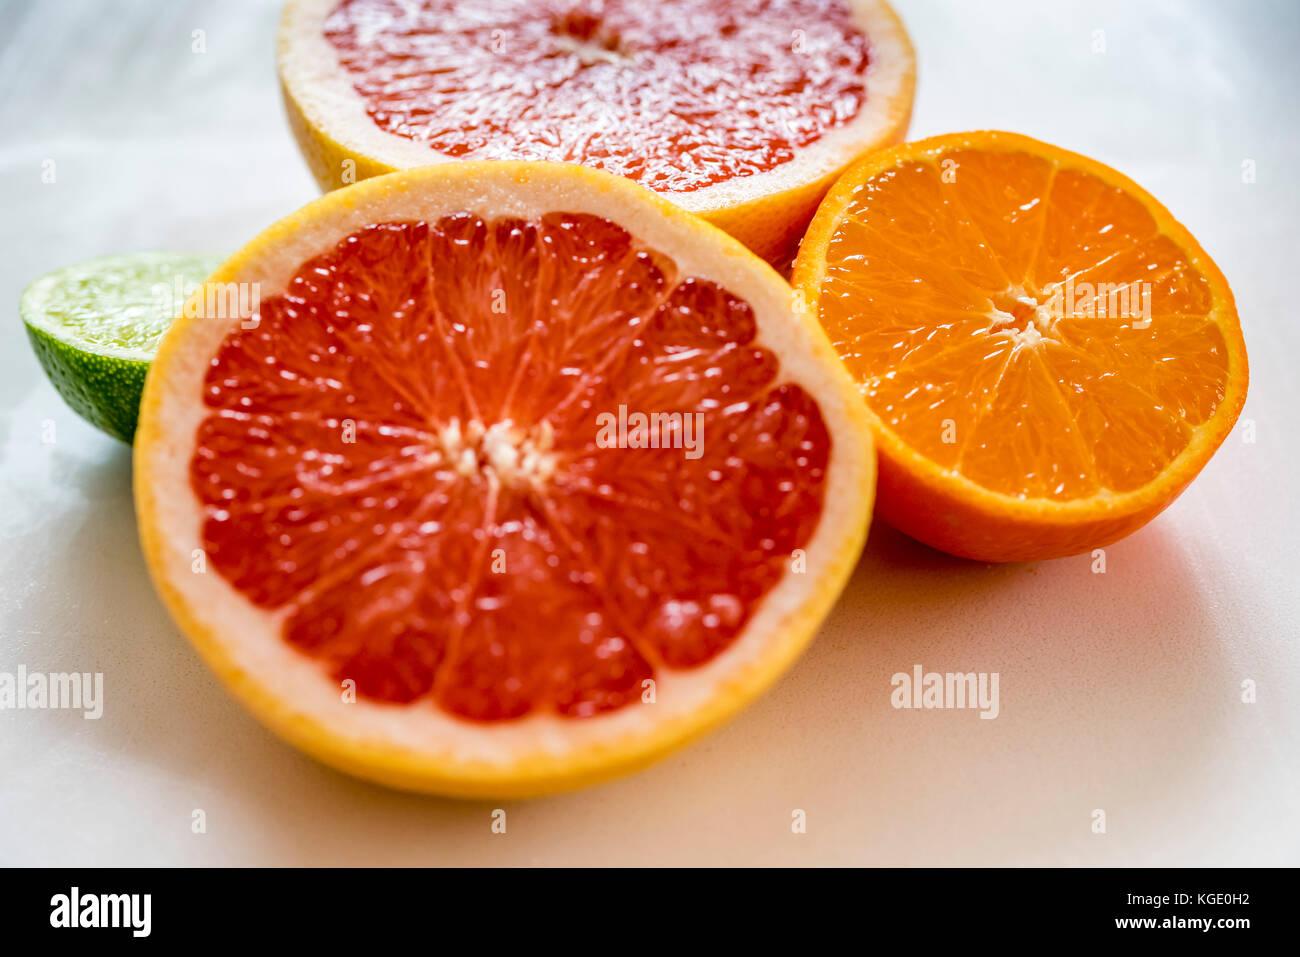 Colorful half citrus fruit, side view, closeup. Grapefruit, orange and lime fruit halves, macro, horizontal. - Stock Image